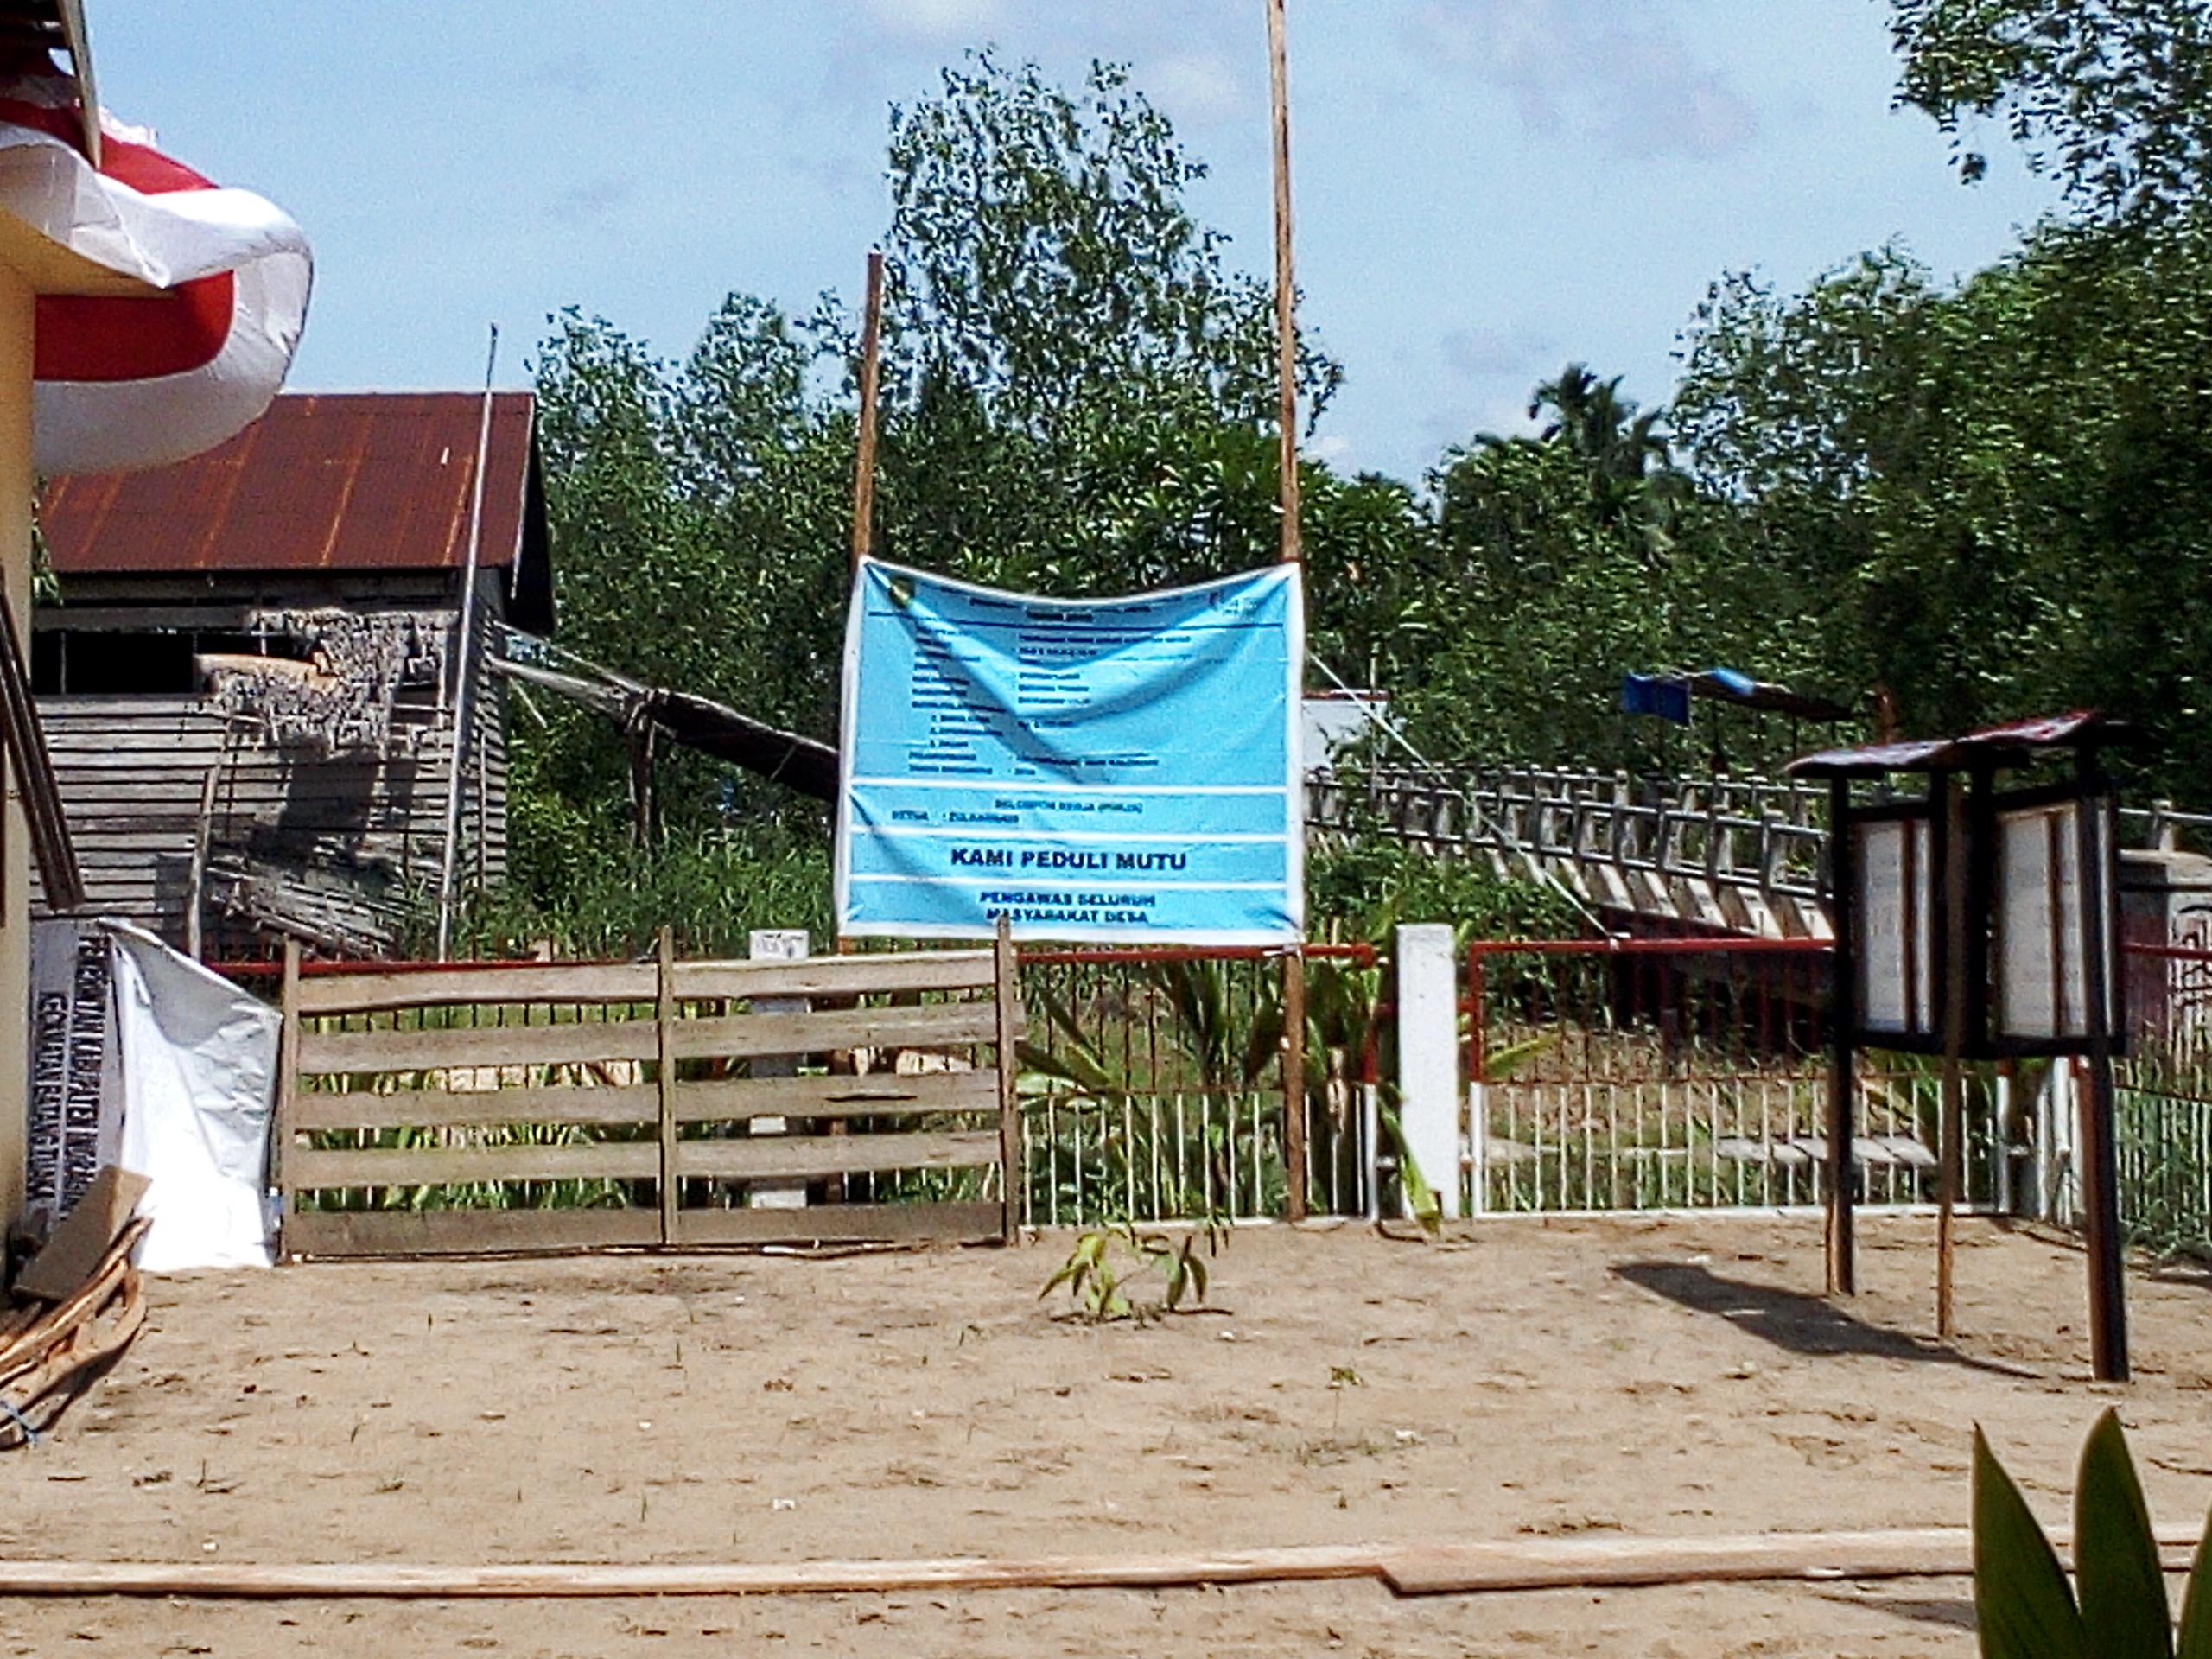 Dulu Berlumpur Kini Halaman Kantor Desa Sungai Luar Inhil Luas untuk Parkir